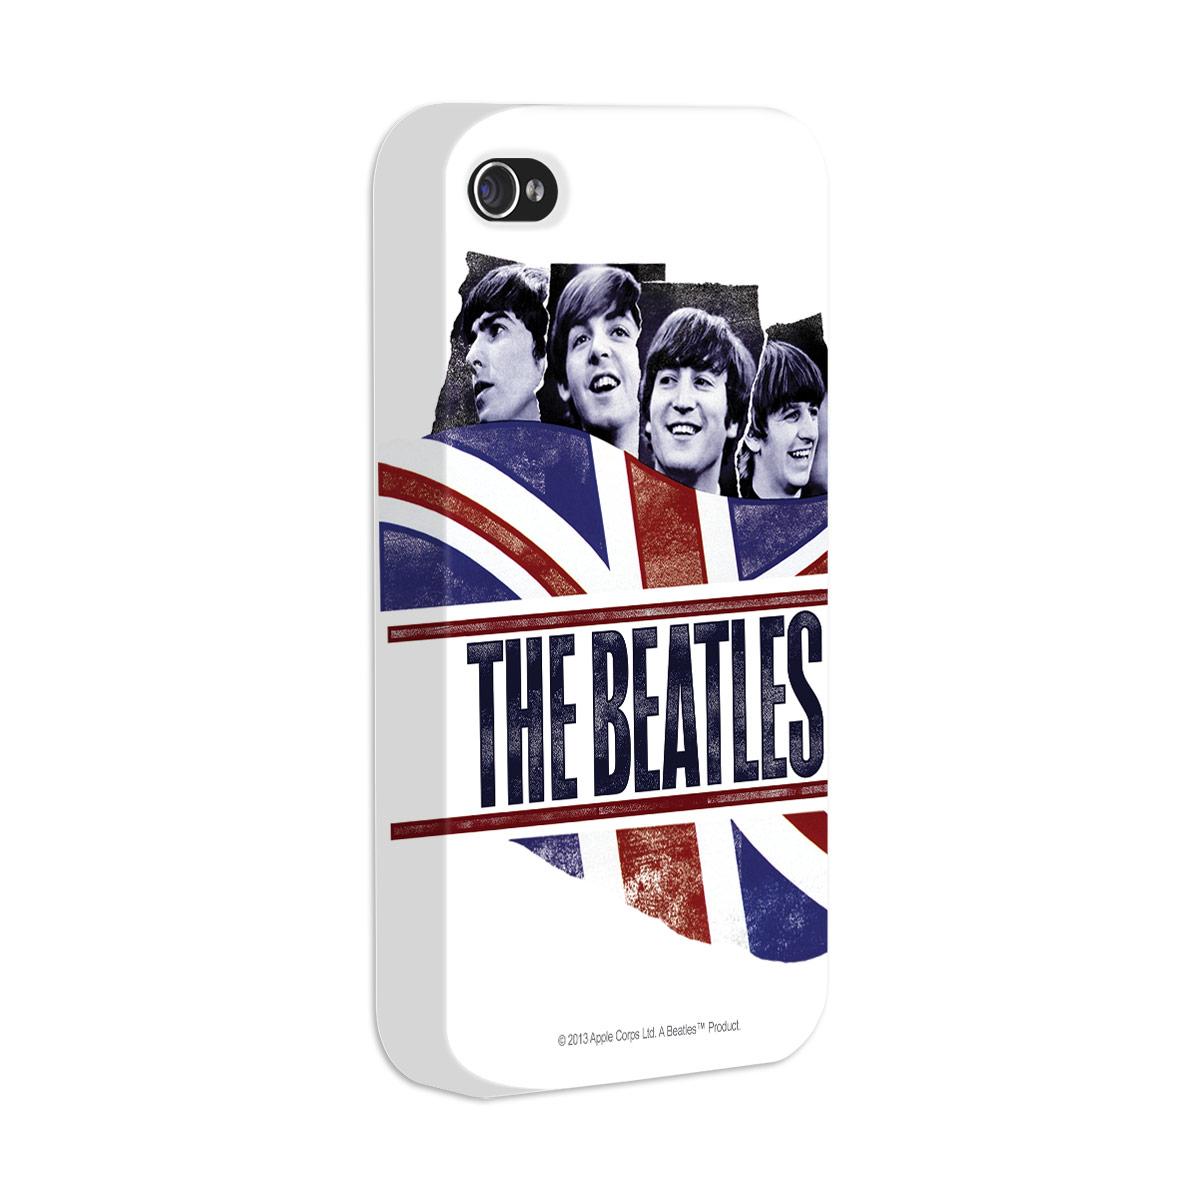 Capa de iPhone 4/4S The Beatles England Flag